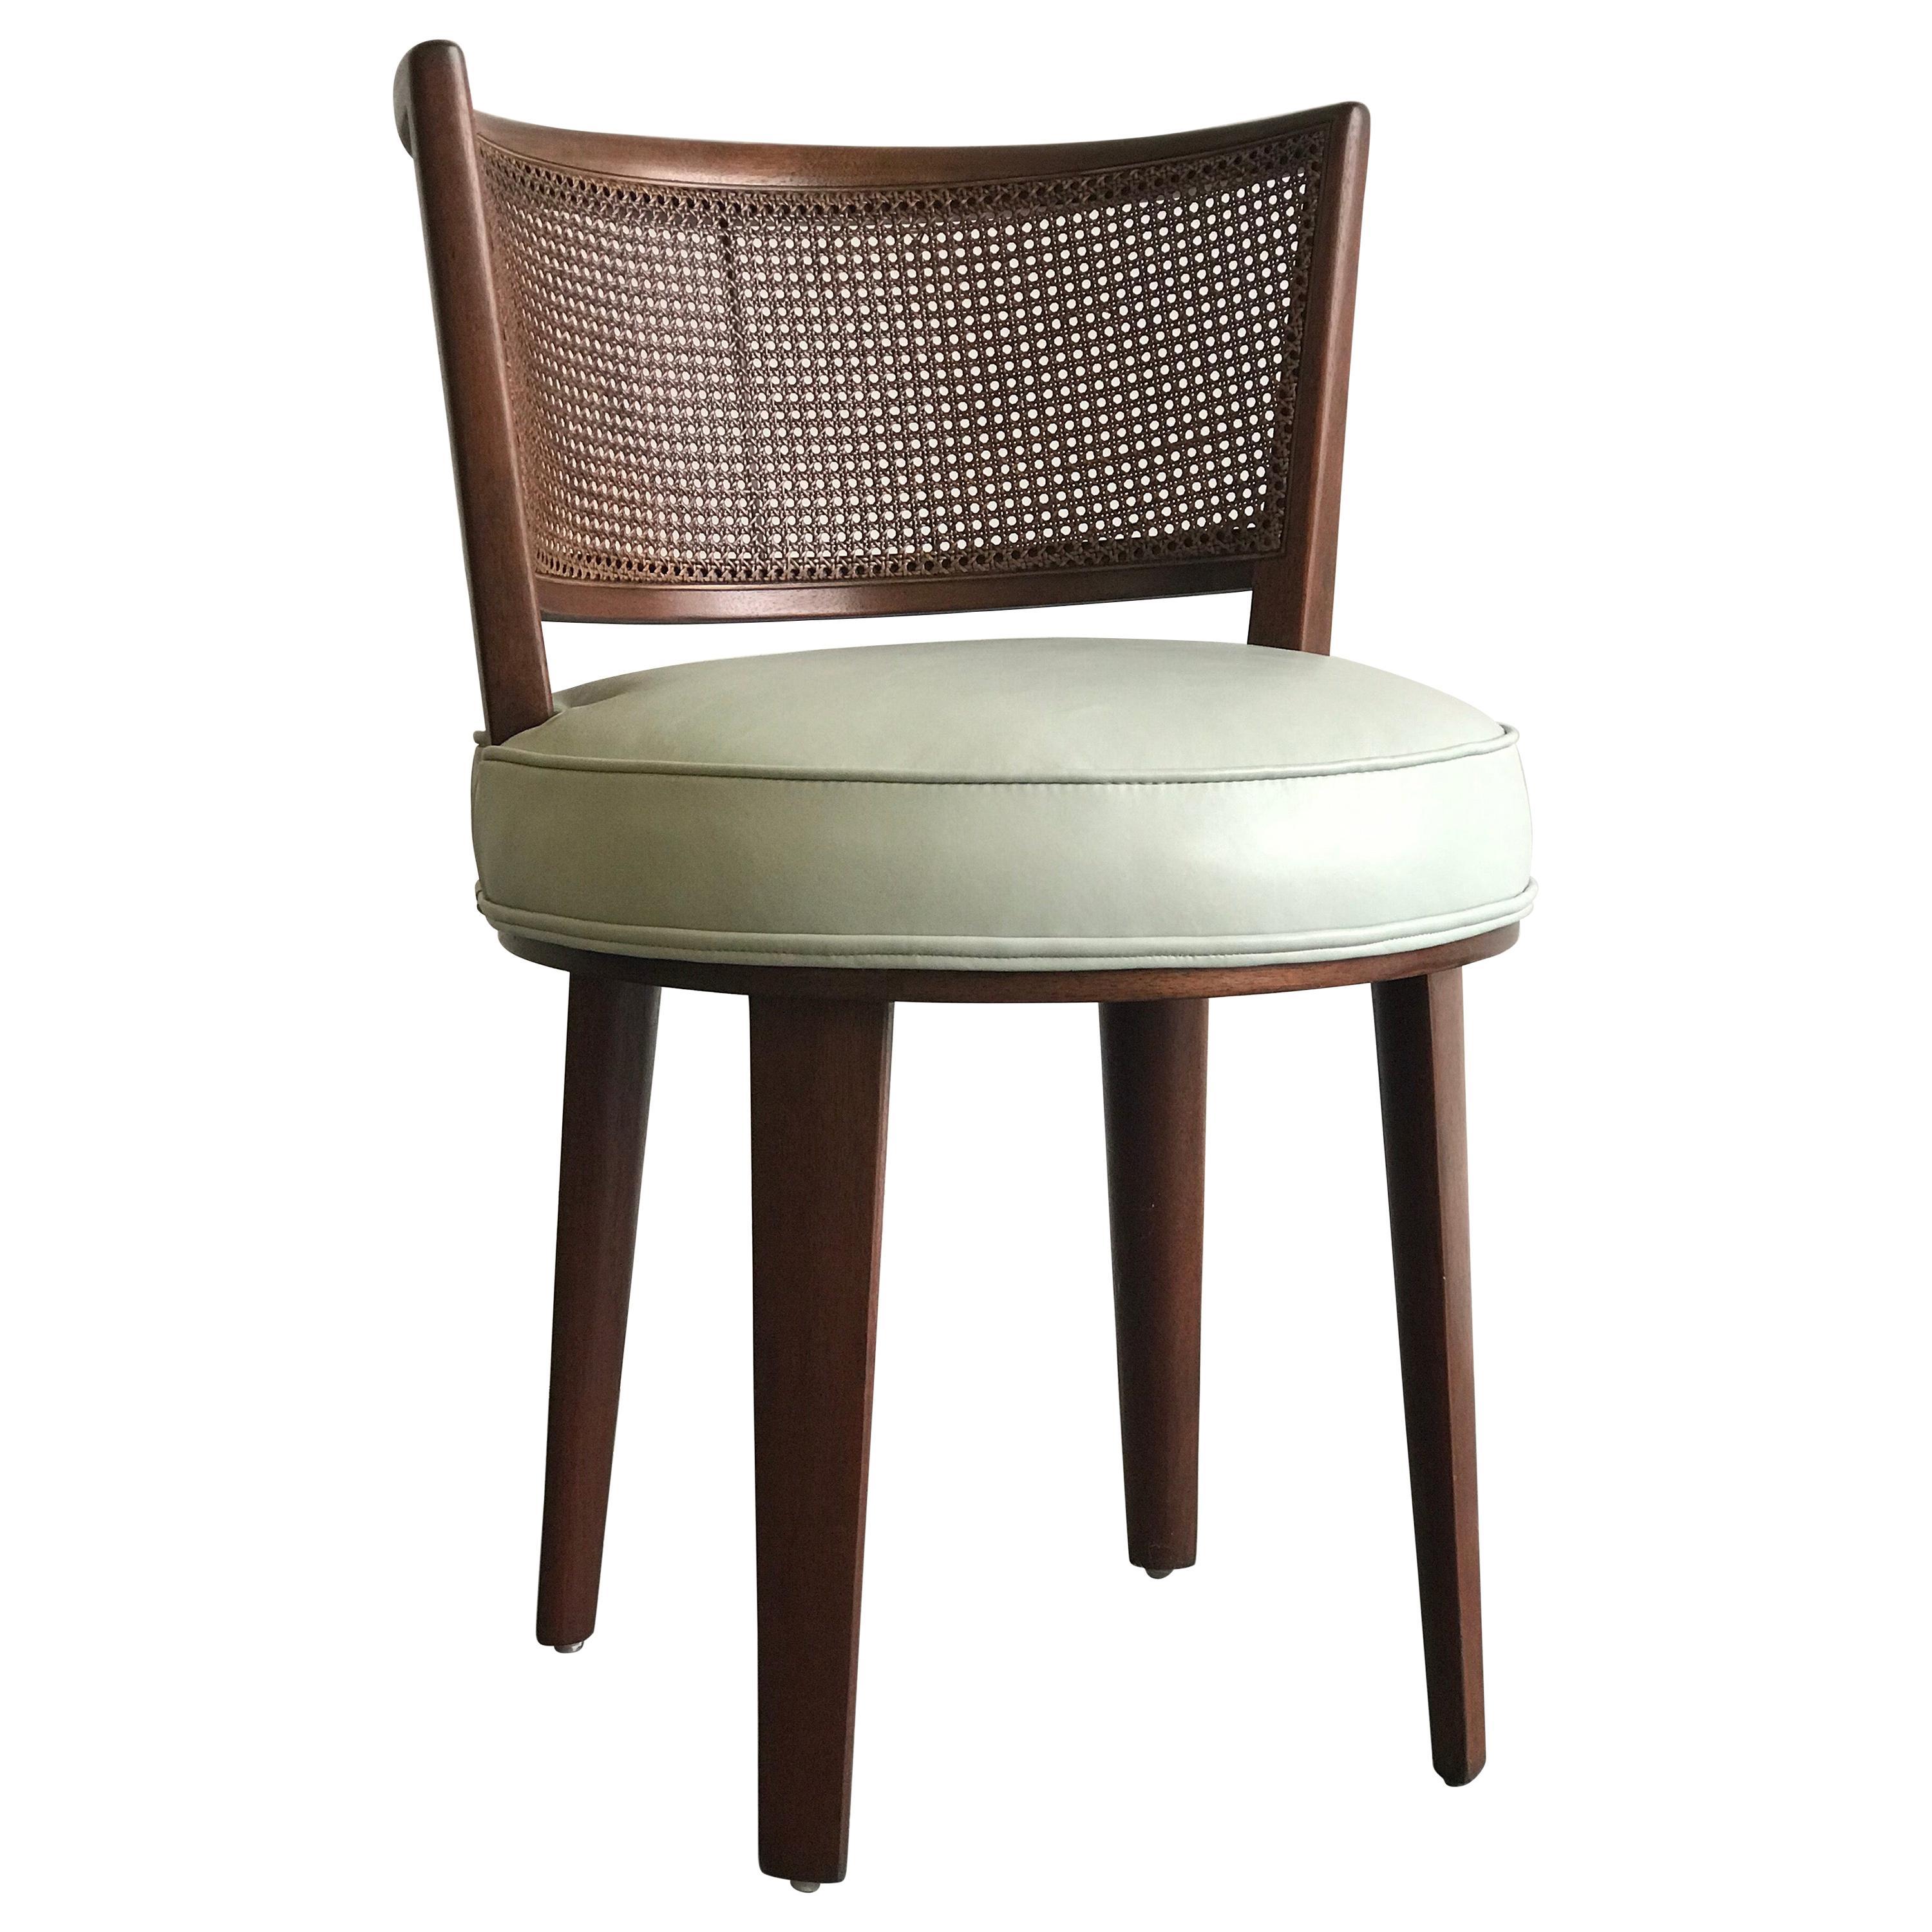 Swivel Chair, Edward Wormley for Dunbar, Mahogany Cane Leather, 1950s